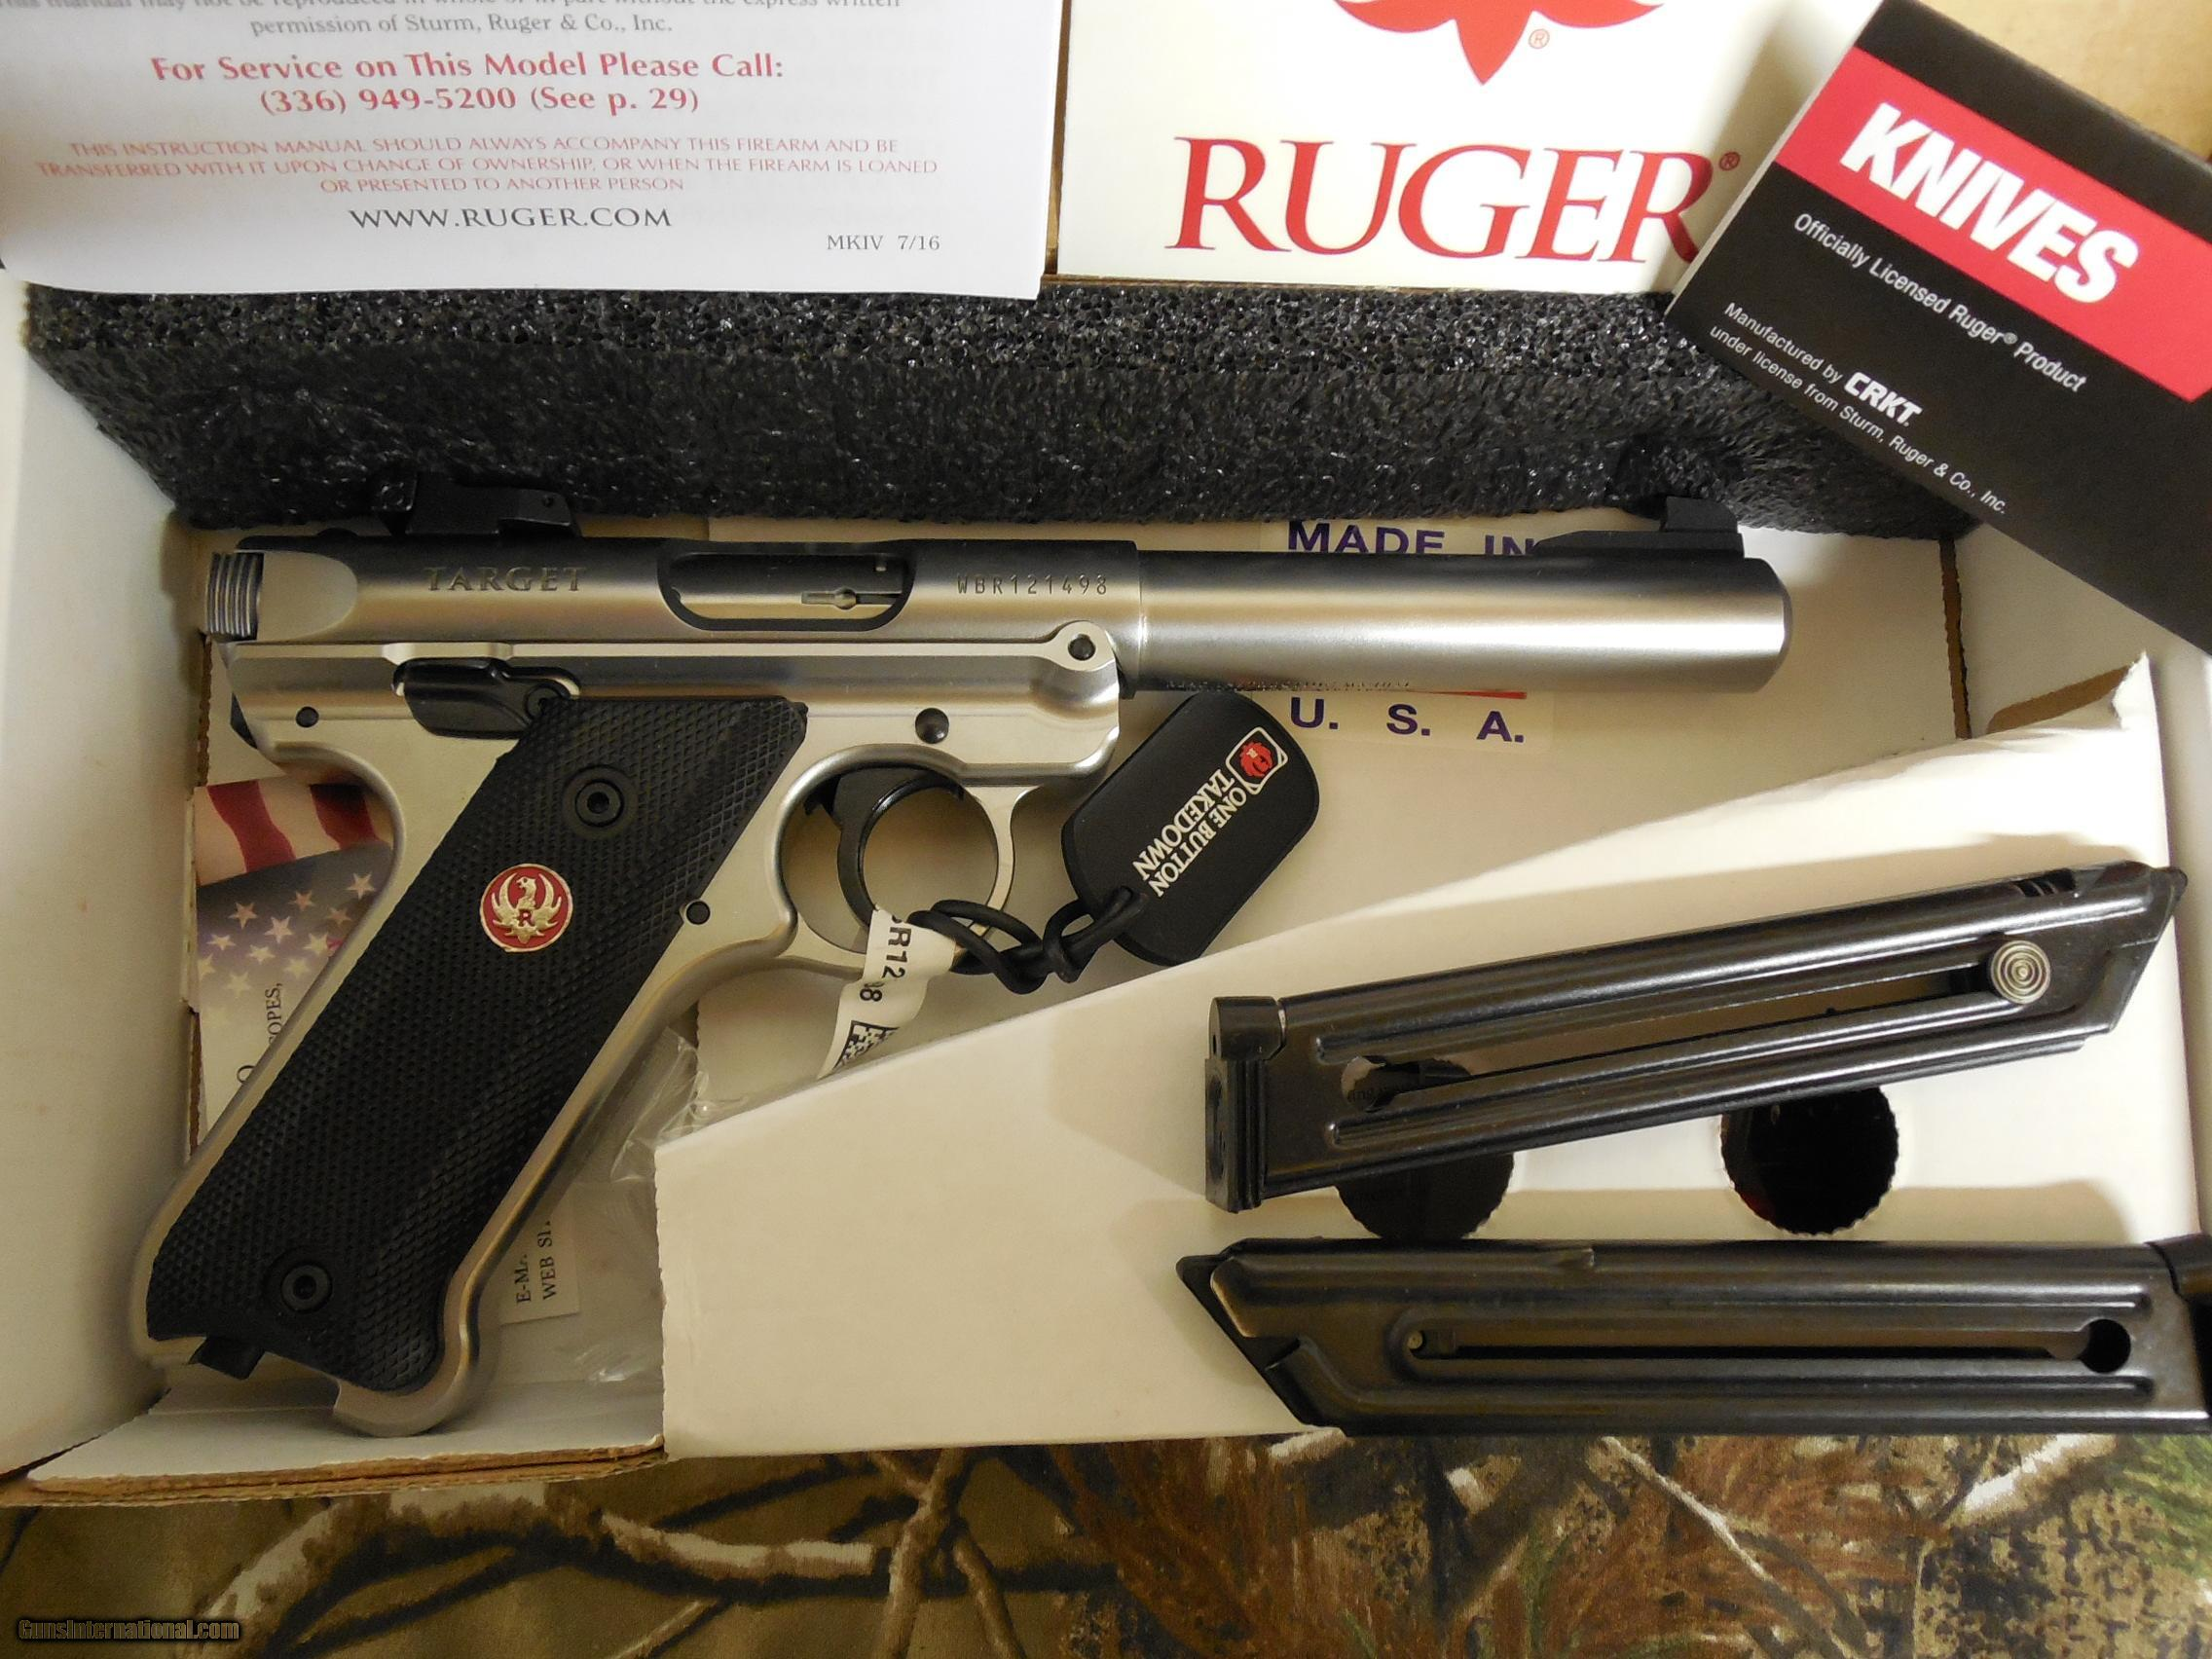 ruger mark iv target 40103 s s 5 5 bull barrel 22 l r rh gunsinternational com Ruger Mark 2 Target Pistol Accessories Ruger Mark 2 Accessories